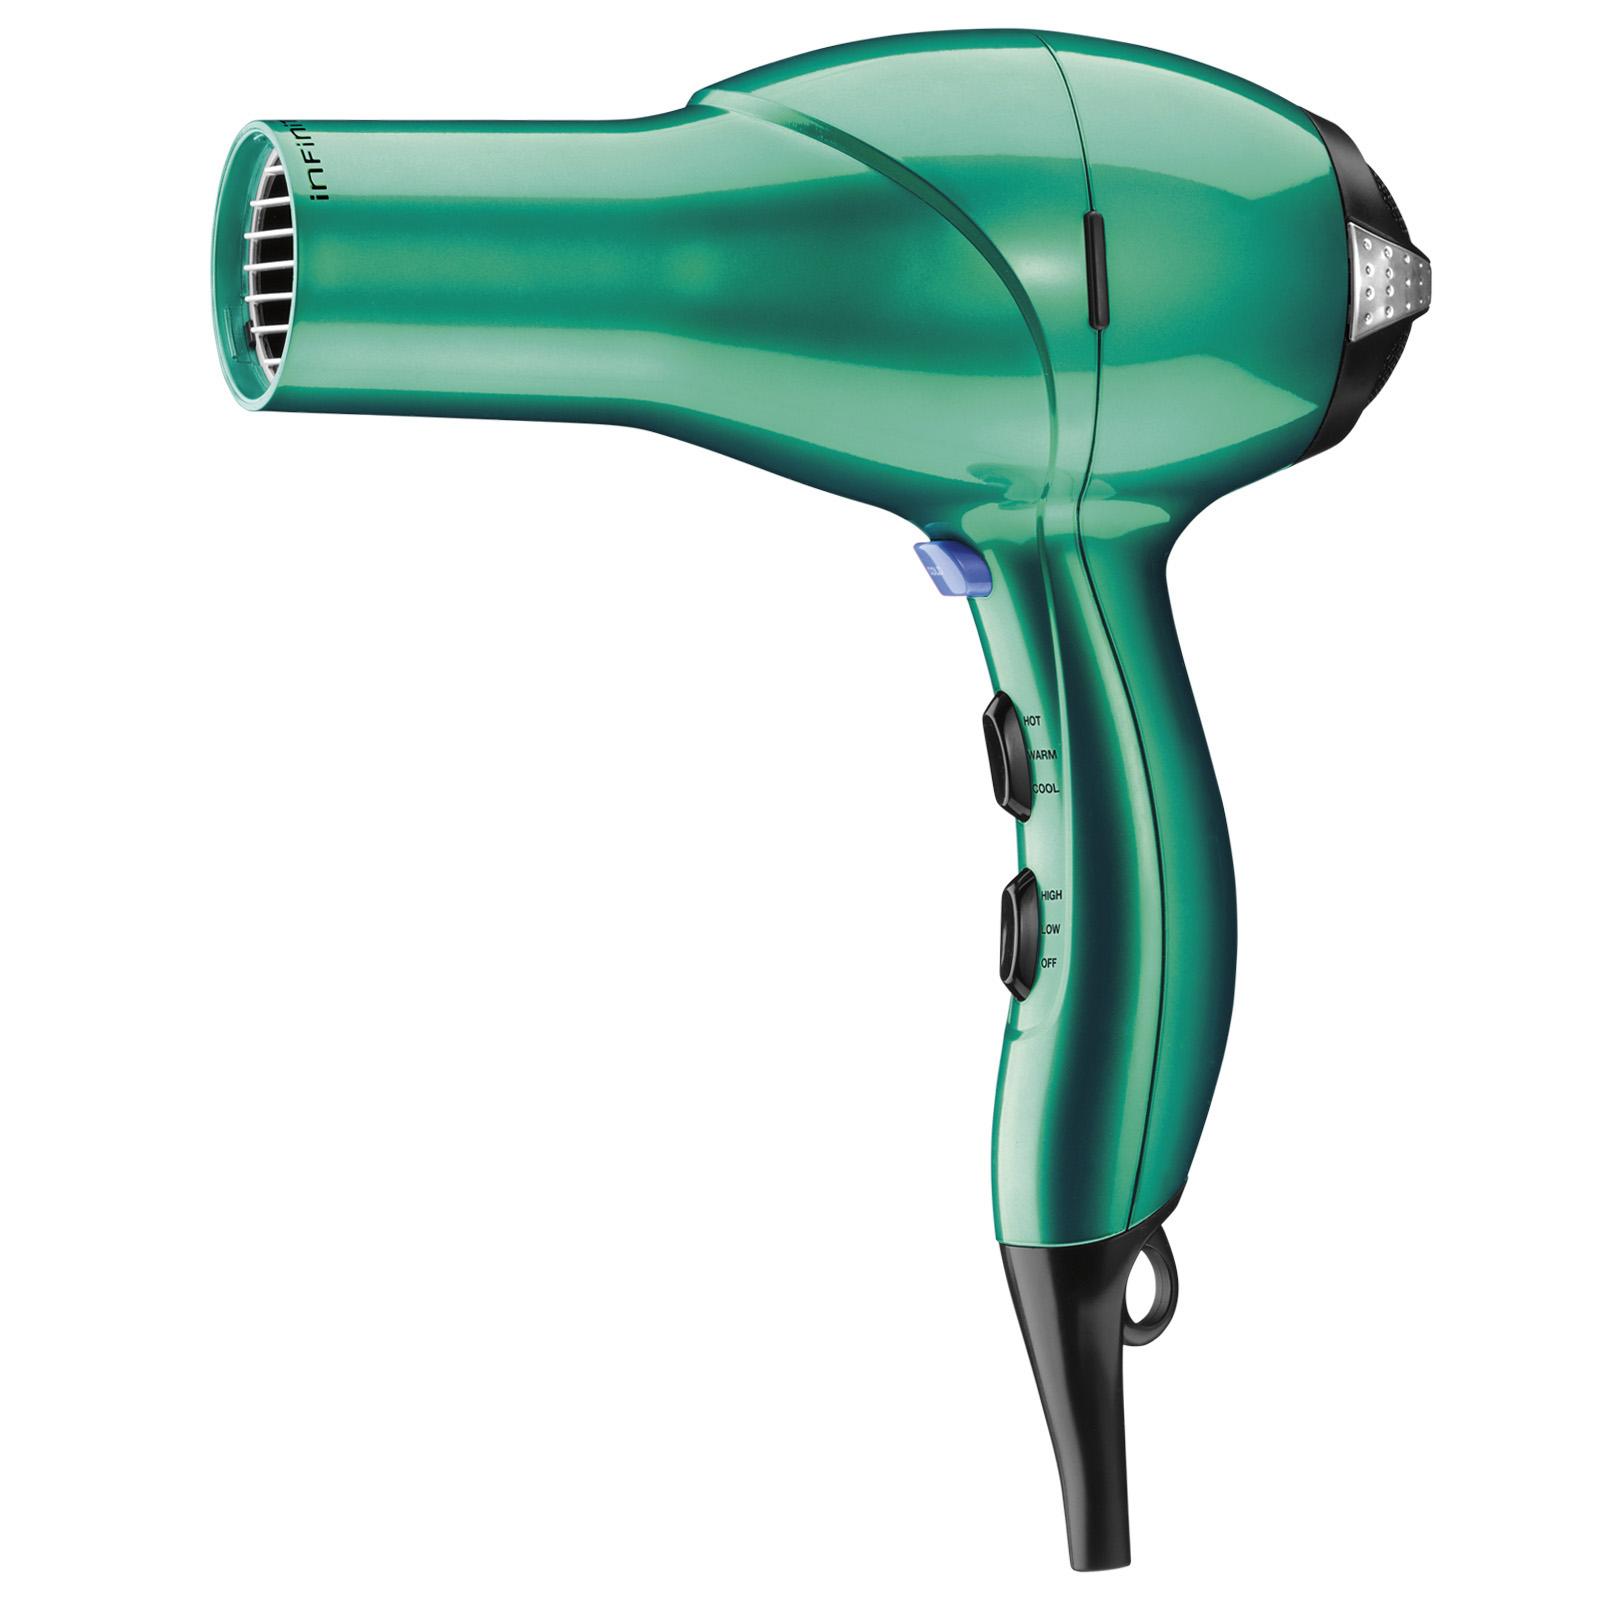 Conair Infiniti Pro Salon Performance Hair Dryer Infiniti Green - Conair